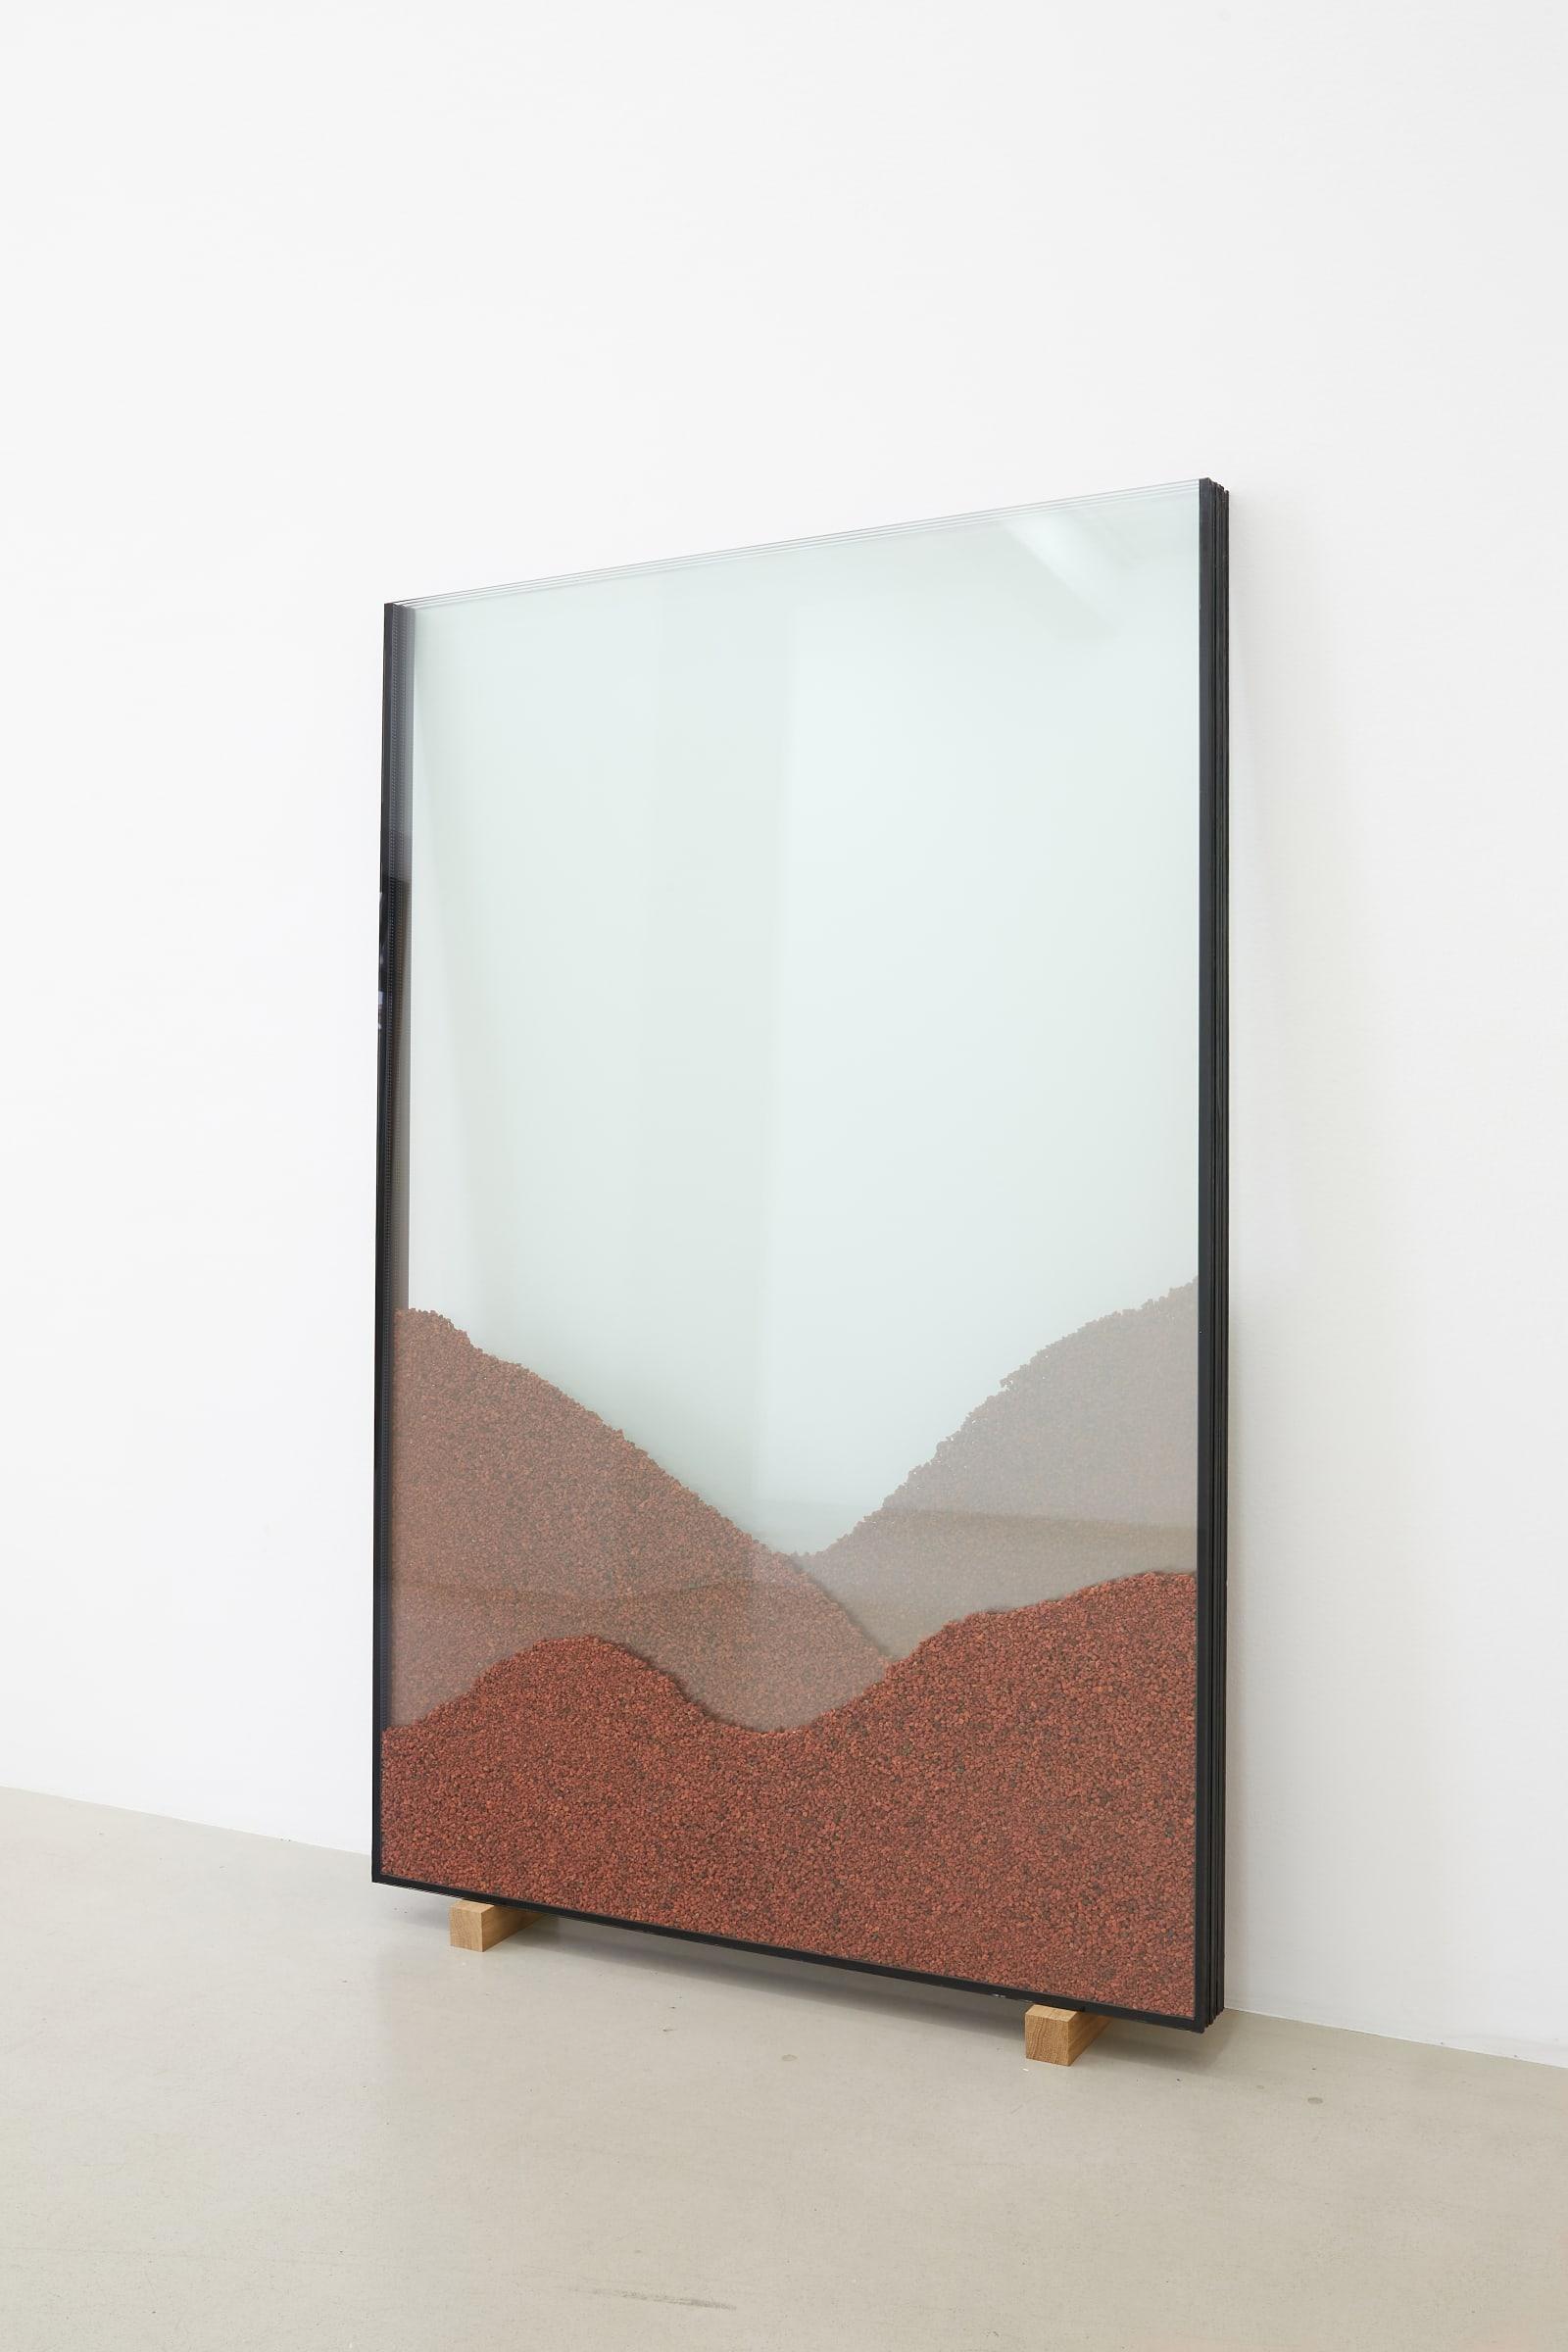 "<span class=""link fancybox-details-link""><a href=""/exhibitions/185/works/artworks17785/"">View Detail Page</a></span><div class=""artist""><strong>RAGNA RÓBERTSDÓTTIR</strong></div><div class=""title""><em>View</em>, 2021</div><div class=""medium"">glass, red lava from Seyðishólar</div><div class=""dimensions"">150 x 100 x 7 cm<br>59 1/8 x 39 3/8 x 2 3/4 in</div>"